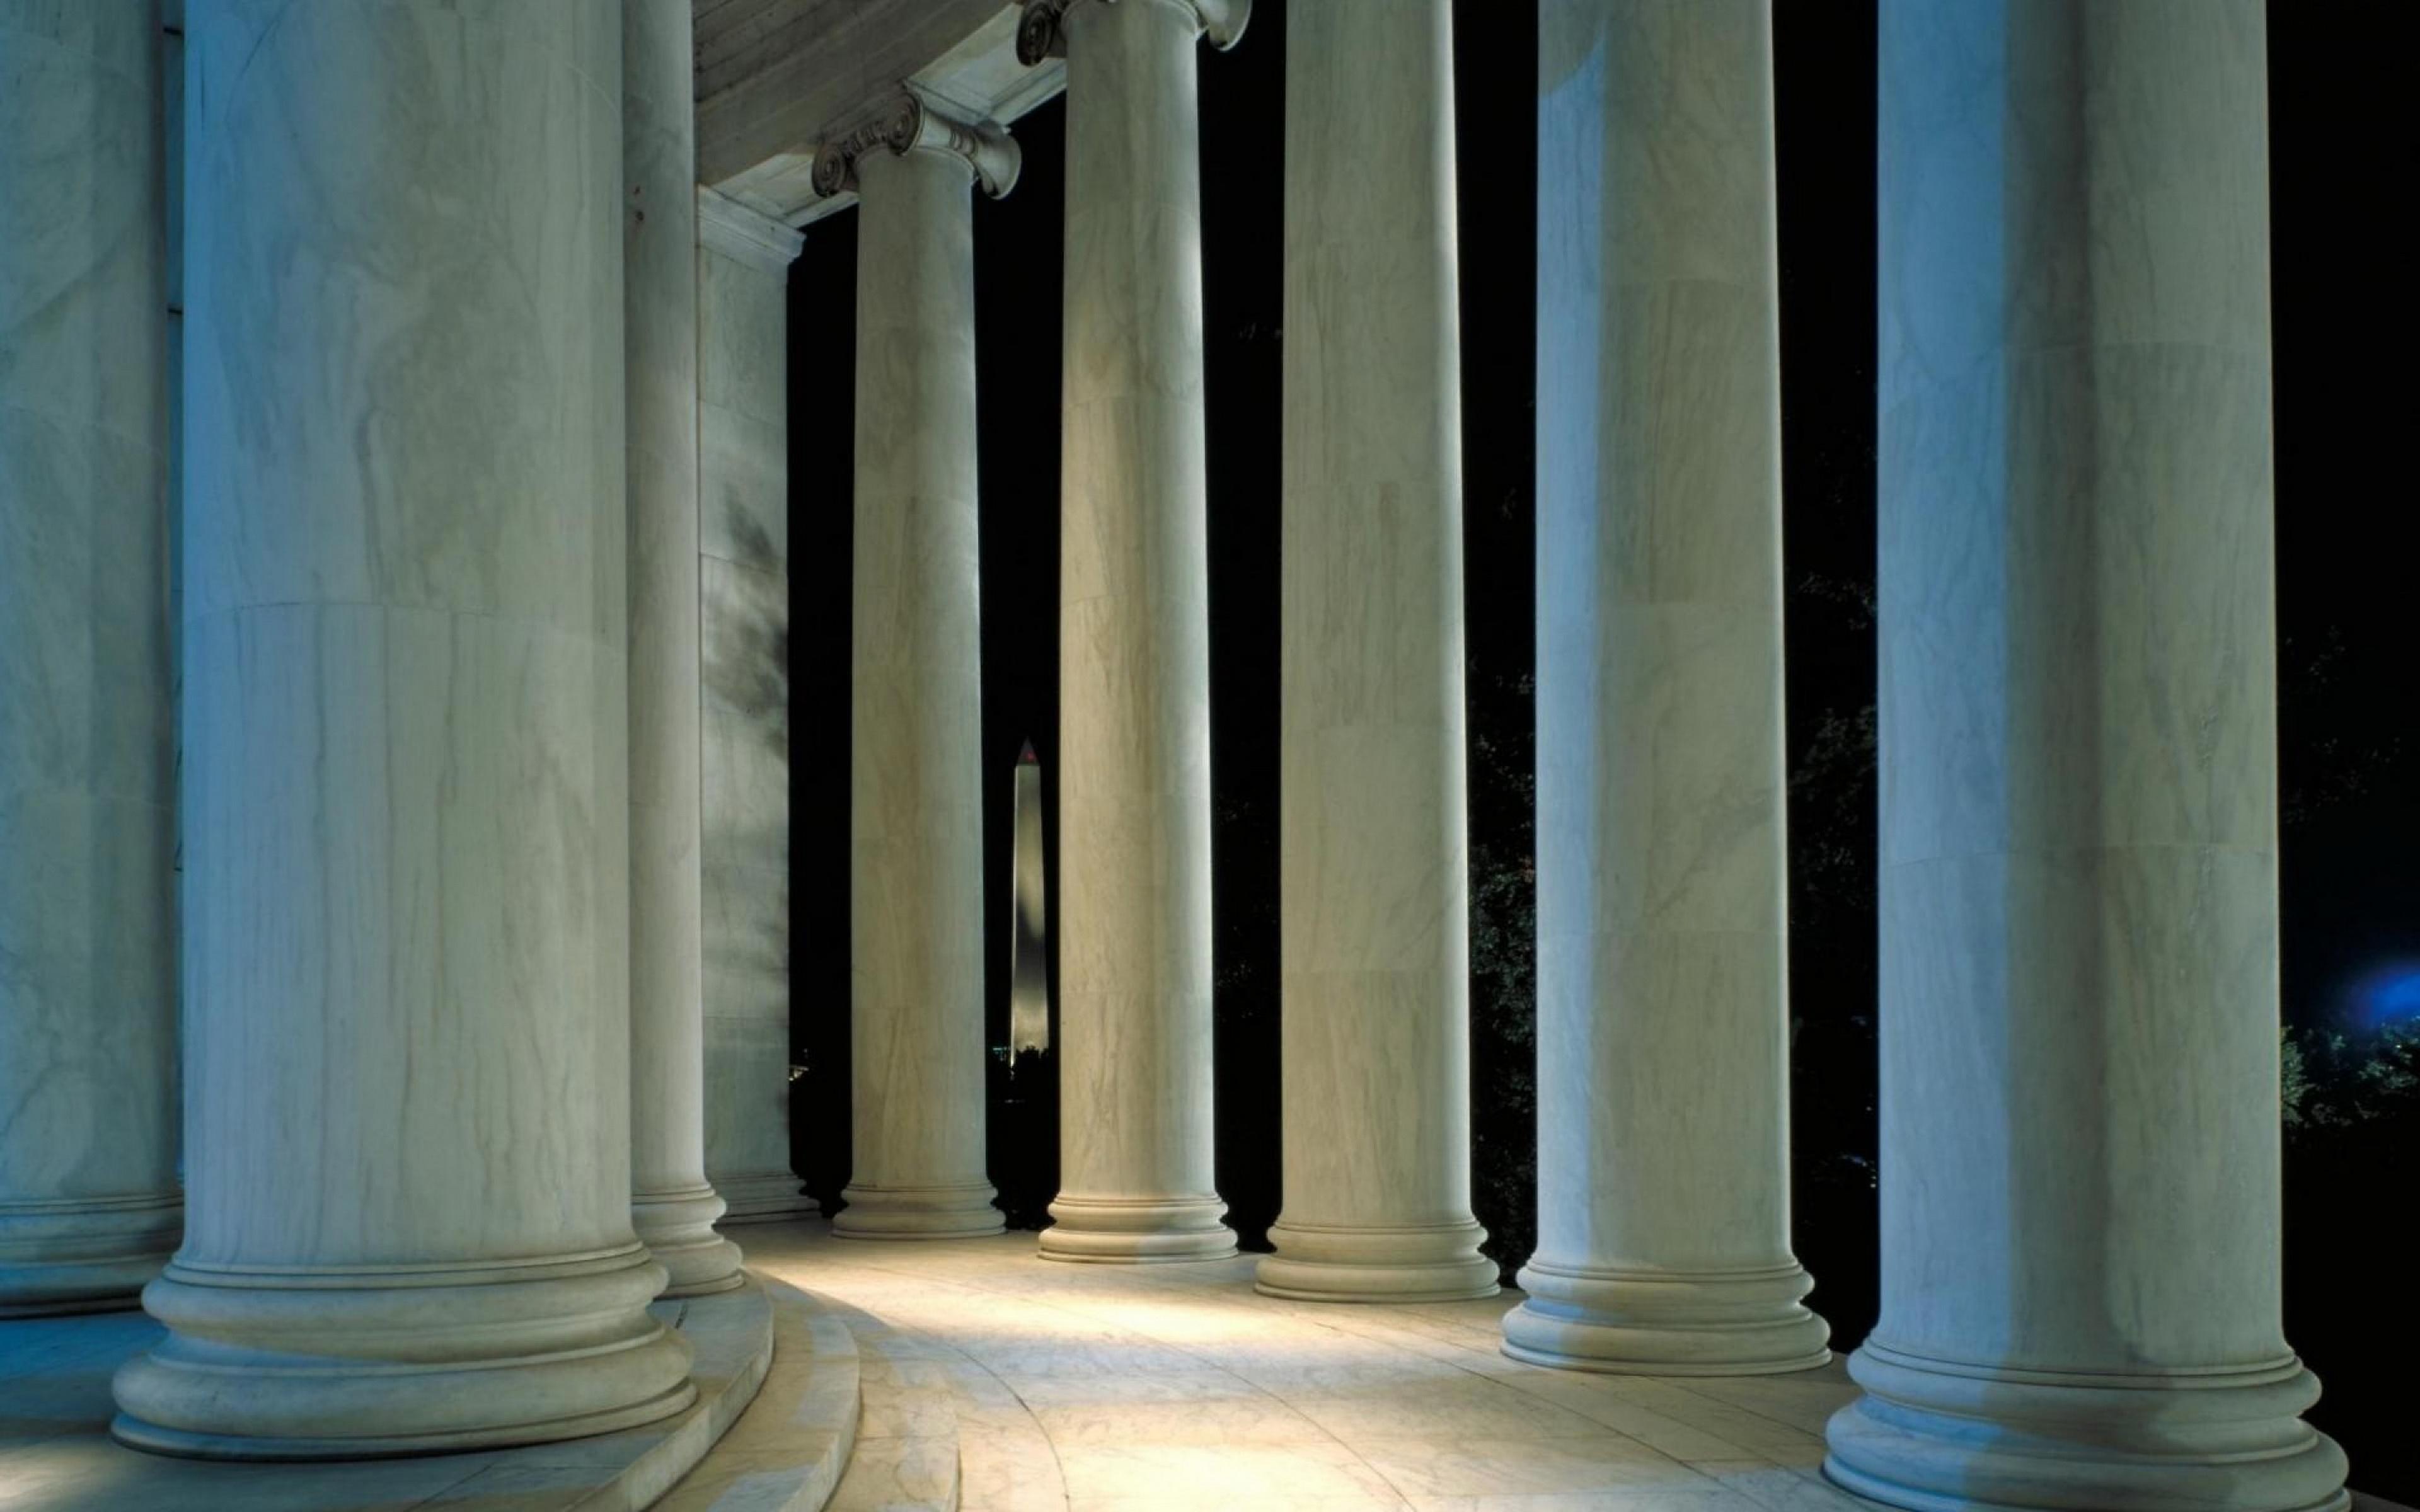 Columns 4k Ultra HD Wallpaper Background Image 3840x2400 ID 3840x2400